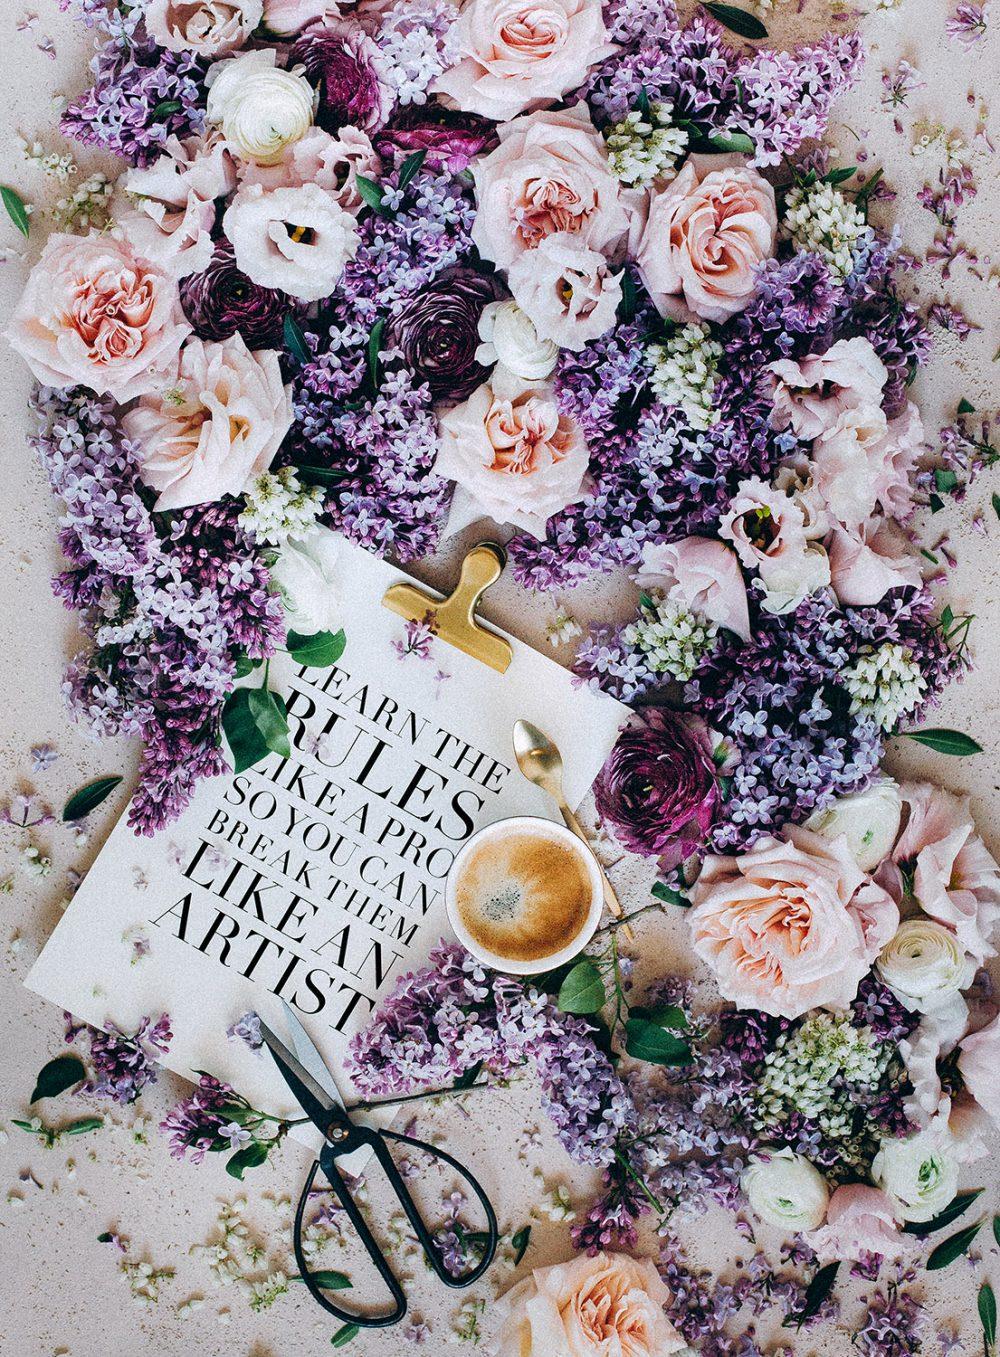 Fine Art Flatlay Wedding mat.kb Quote Learn the rules like a pro so you can break them like an artist Floral Designer Coffee Heiraten Schweiz Hochzeitsdekoration